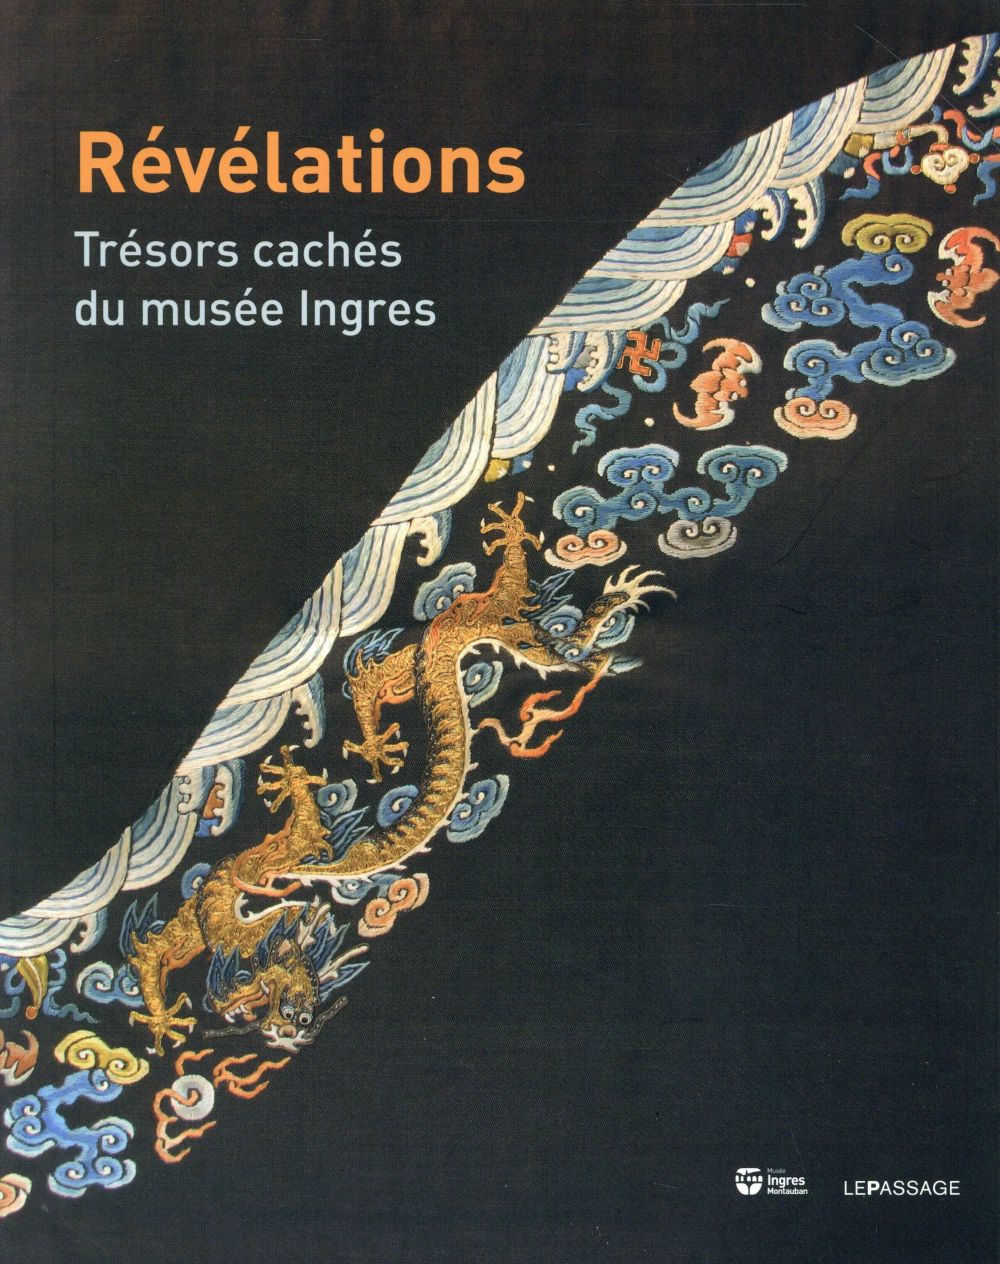 REVELATIONS. TRESORS CACHES DU MUSEE INGRES